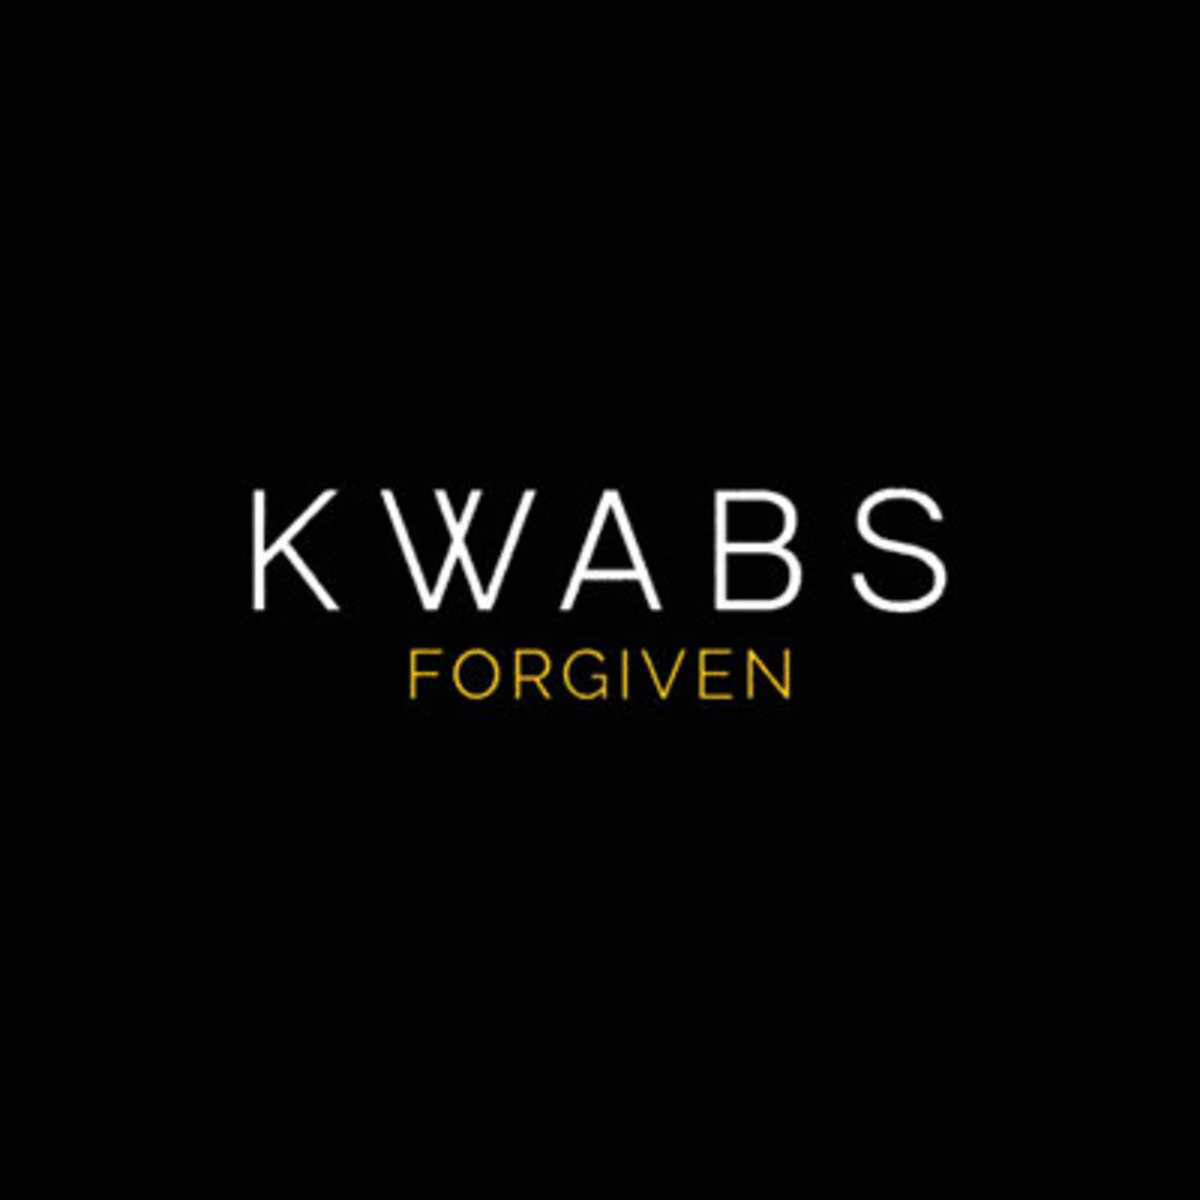 kwabs-forgiven.jpg